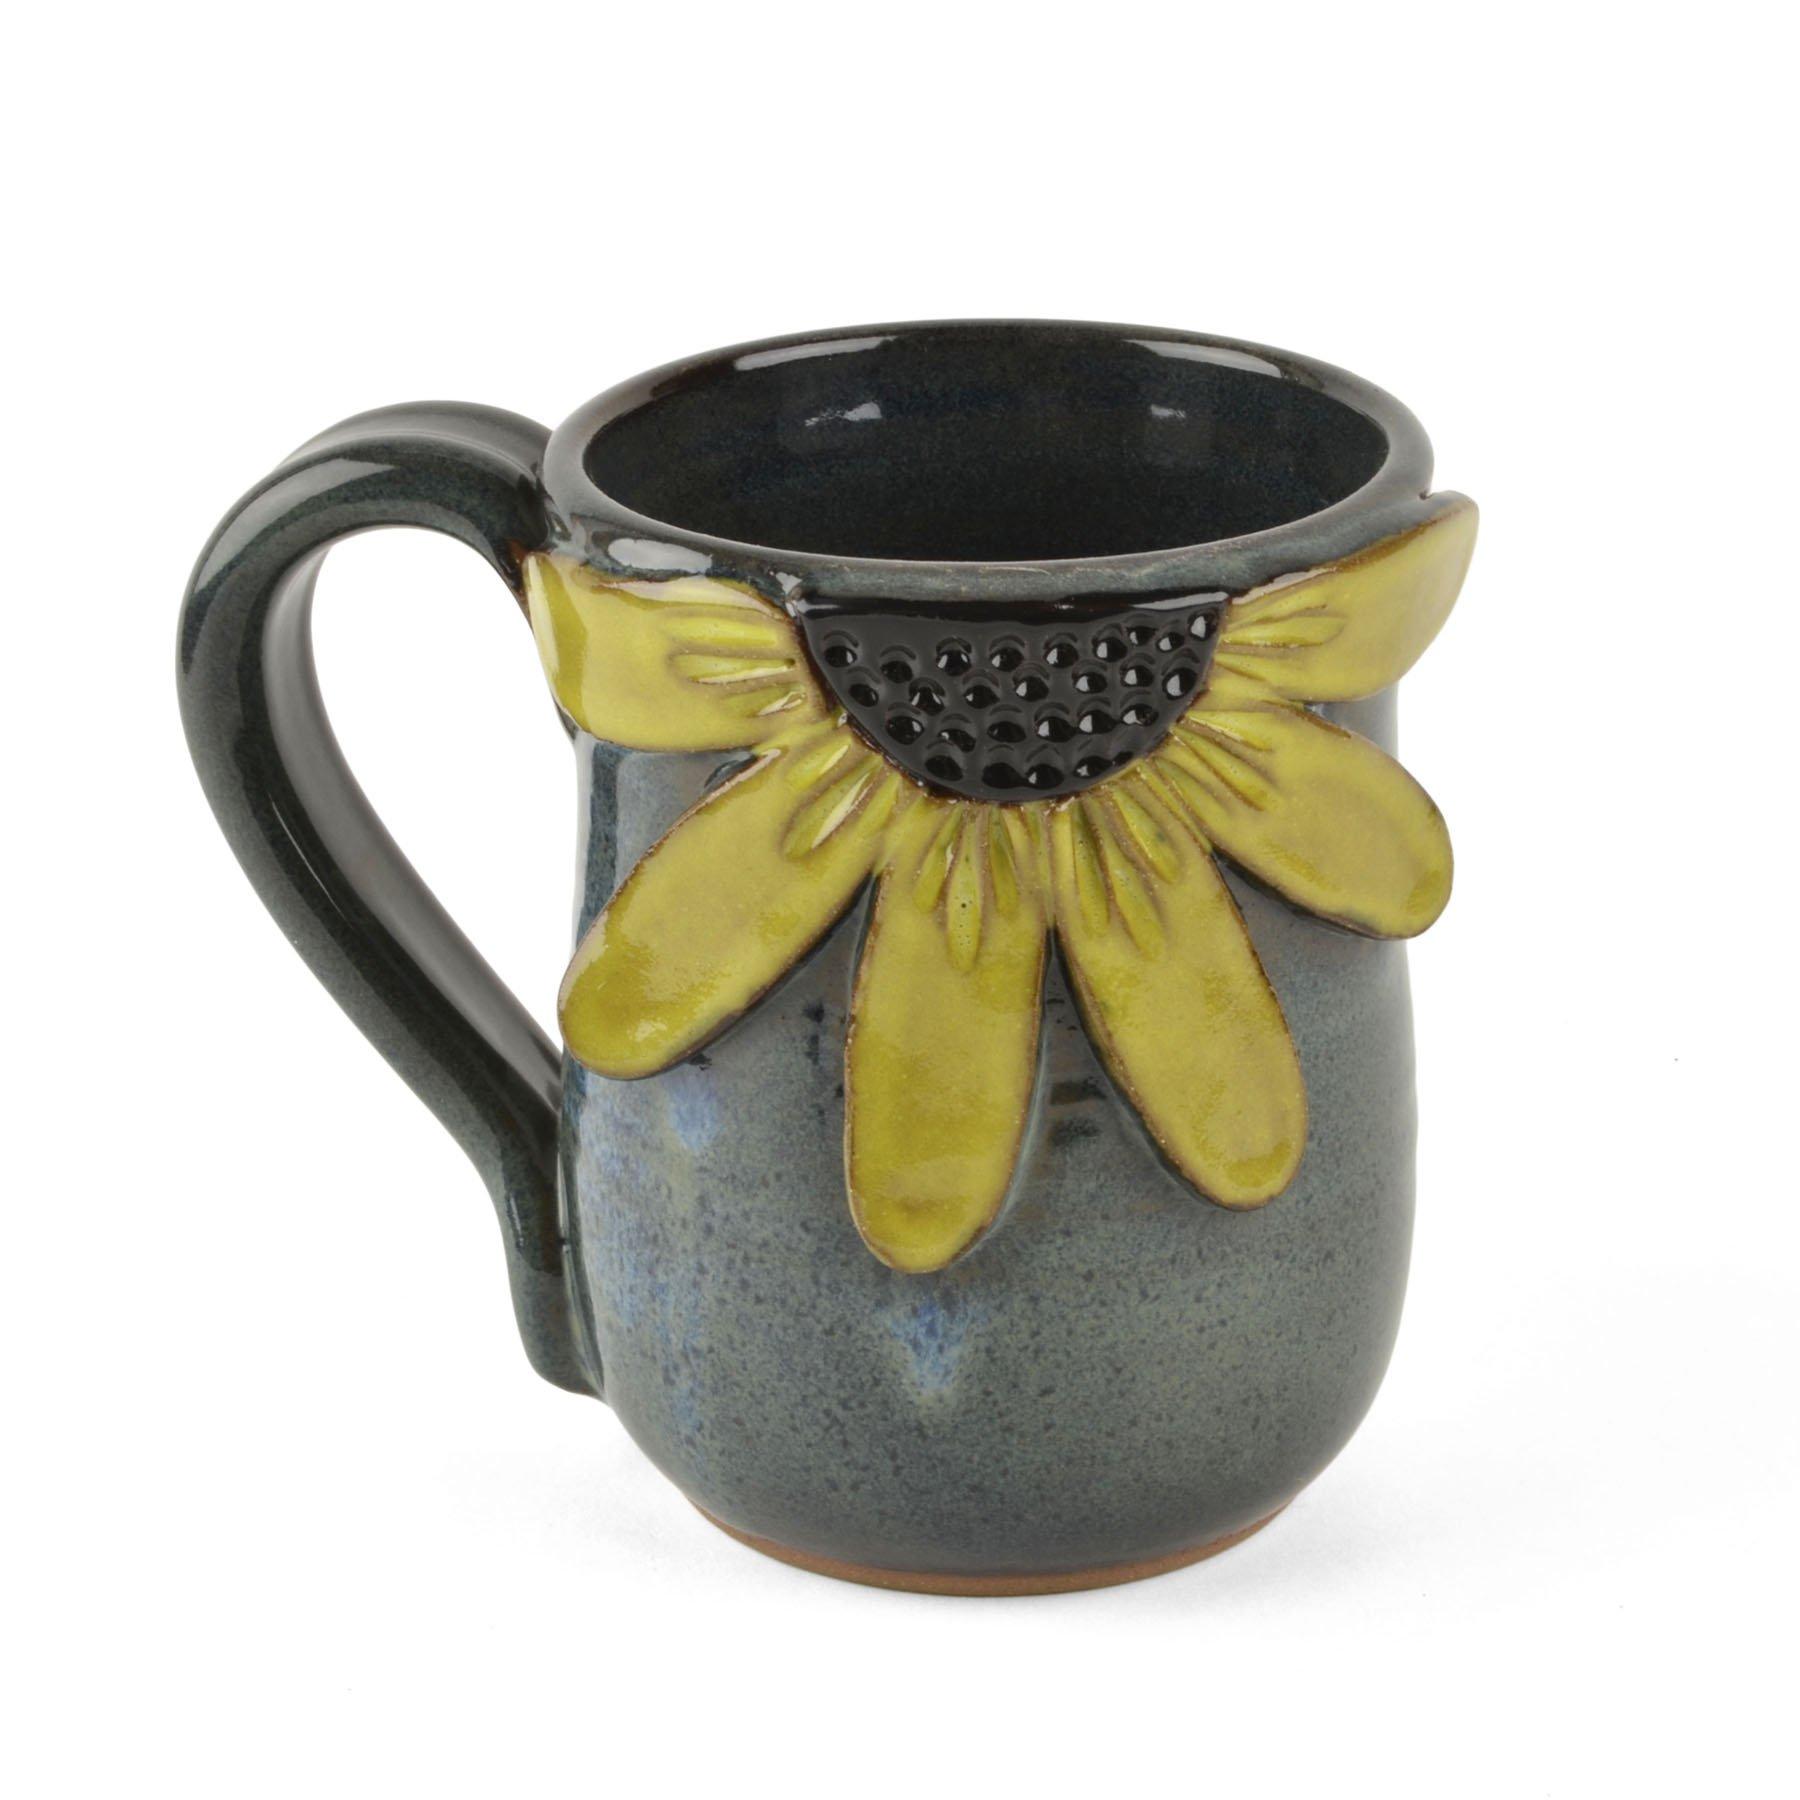 MudWorks Pottery Black-Eyed Susan Mug